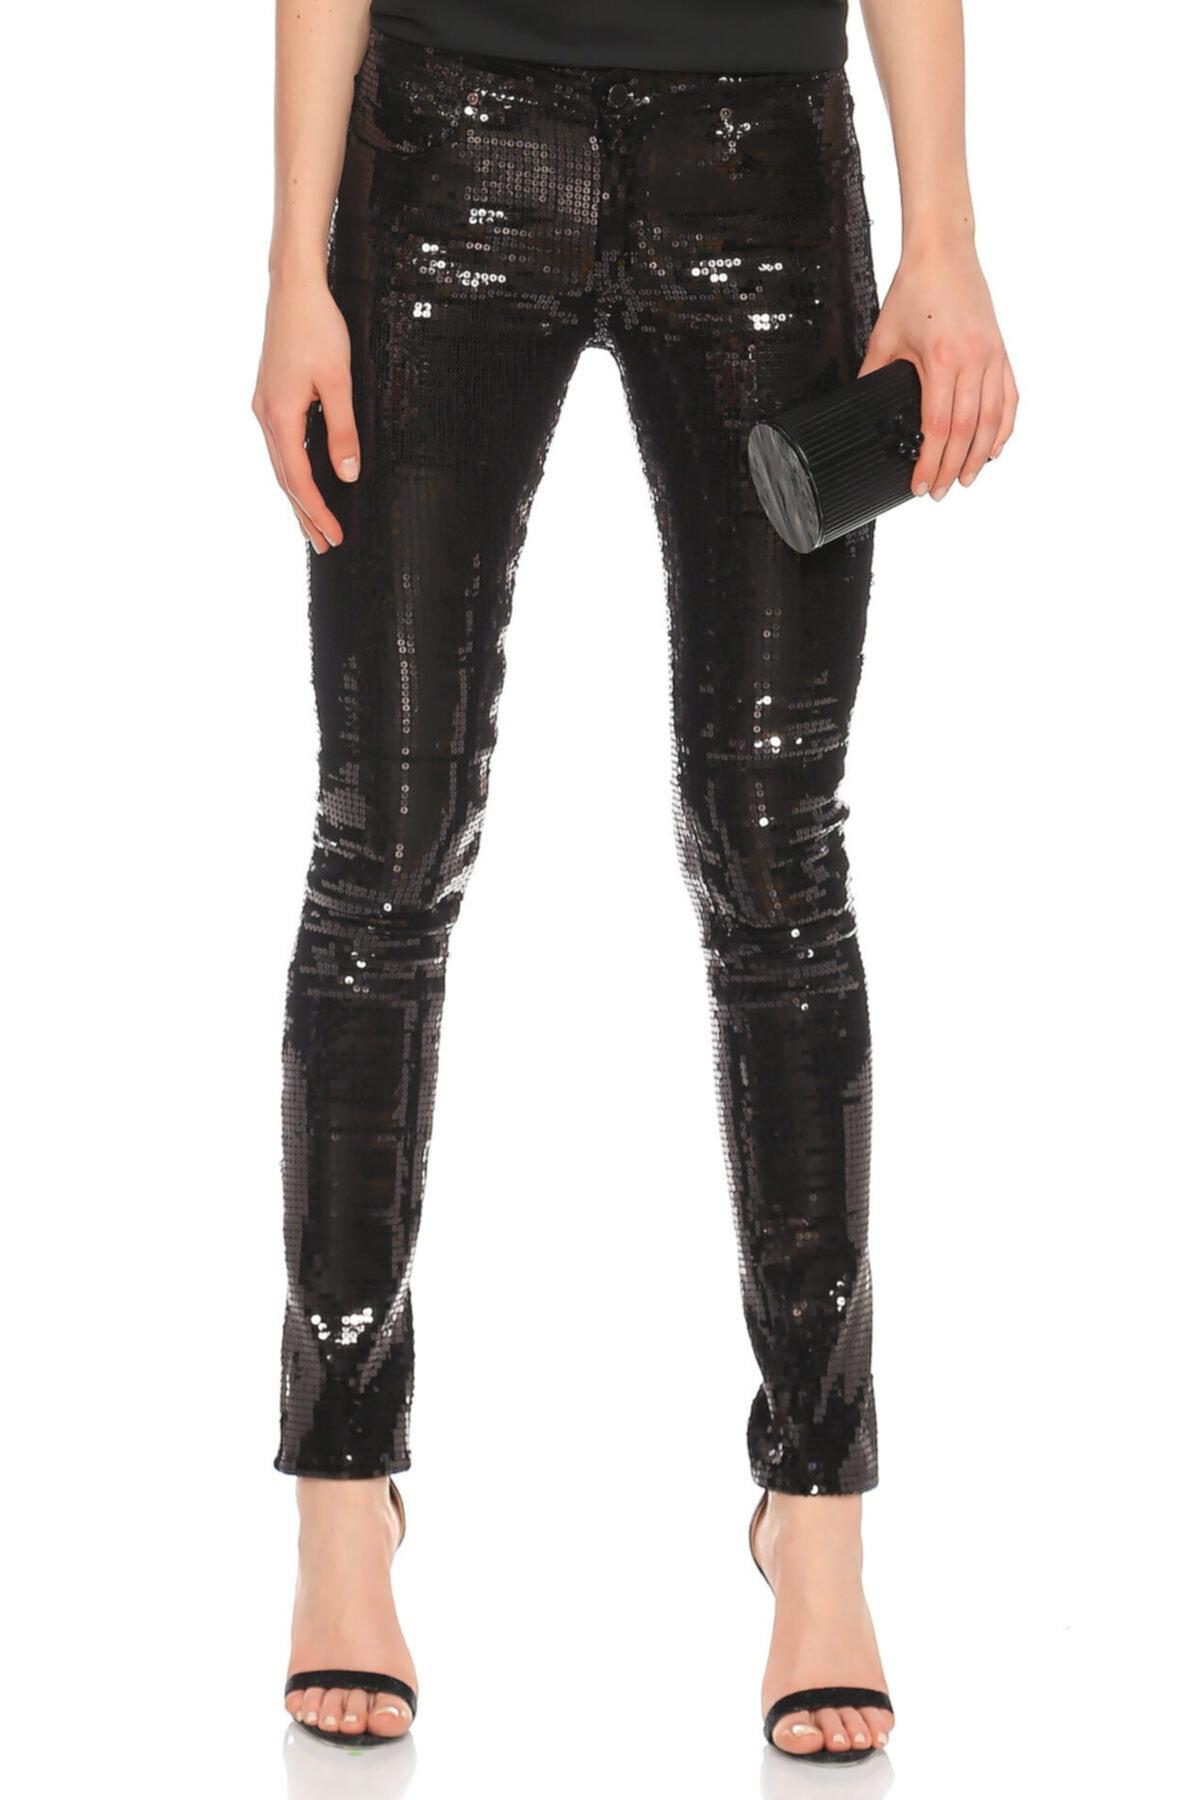 Lotto Vvb Pul-payet Işlemeli Siyah Pantolon 1